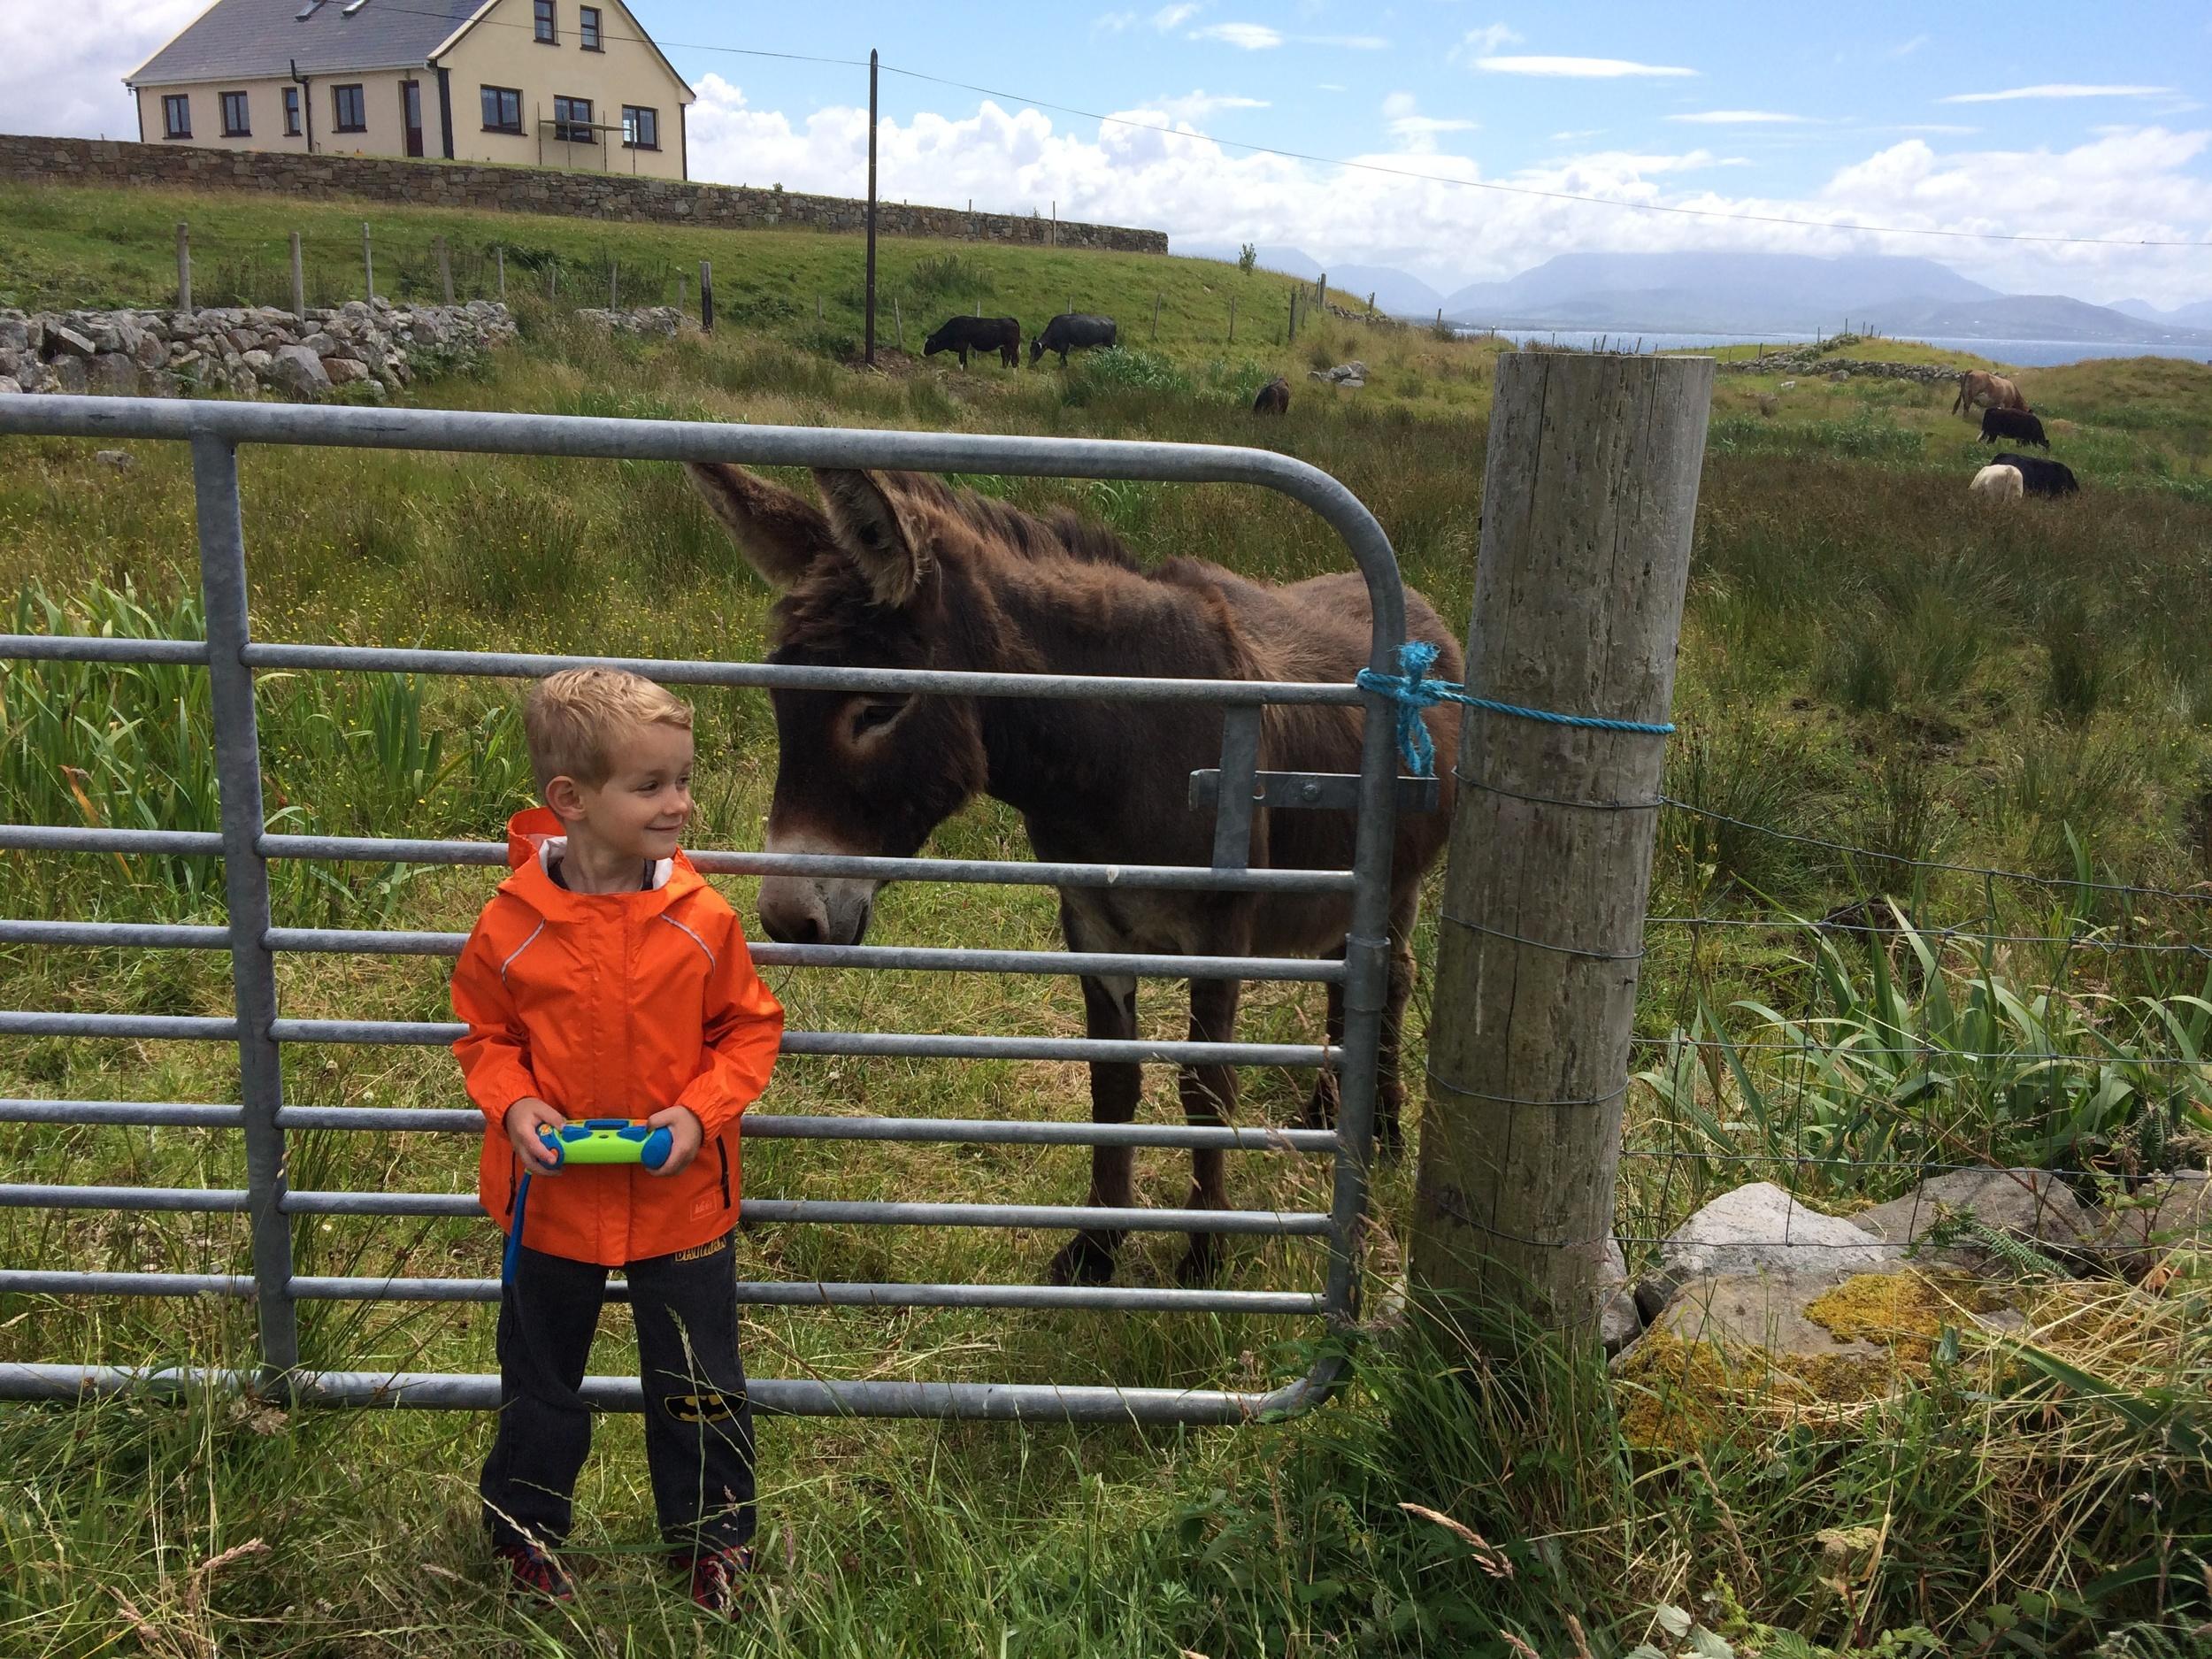 Kian and the sweet donkey